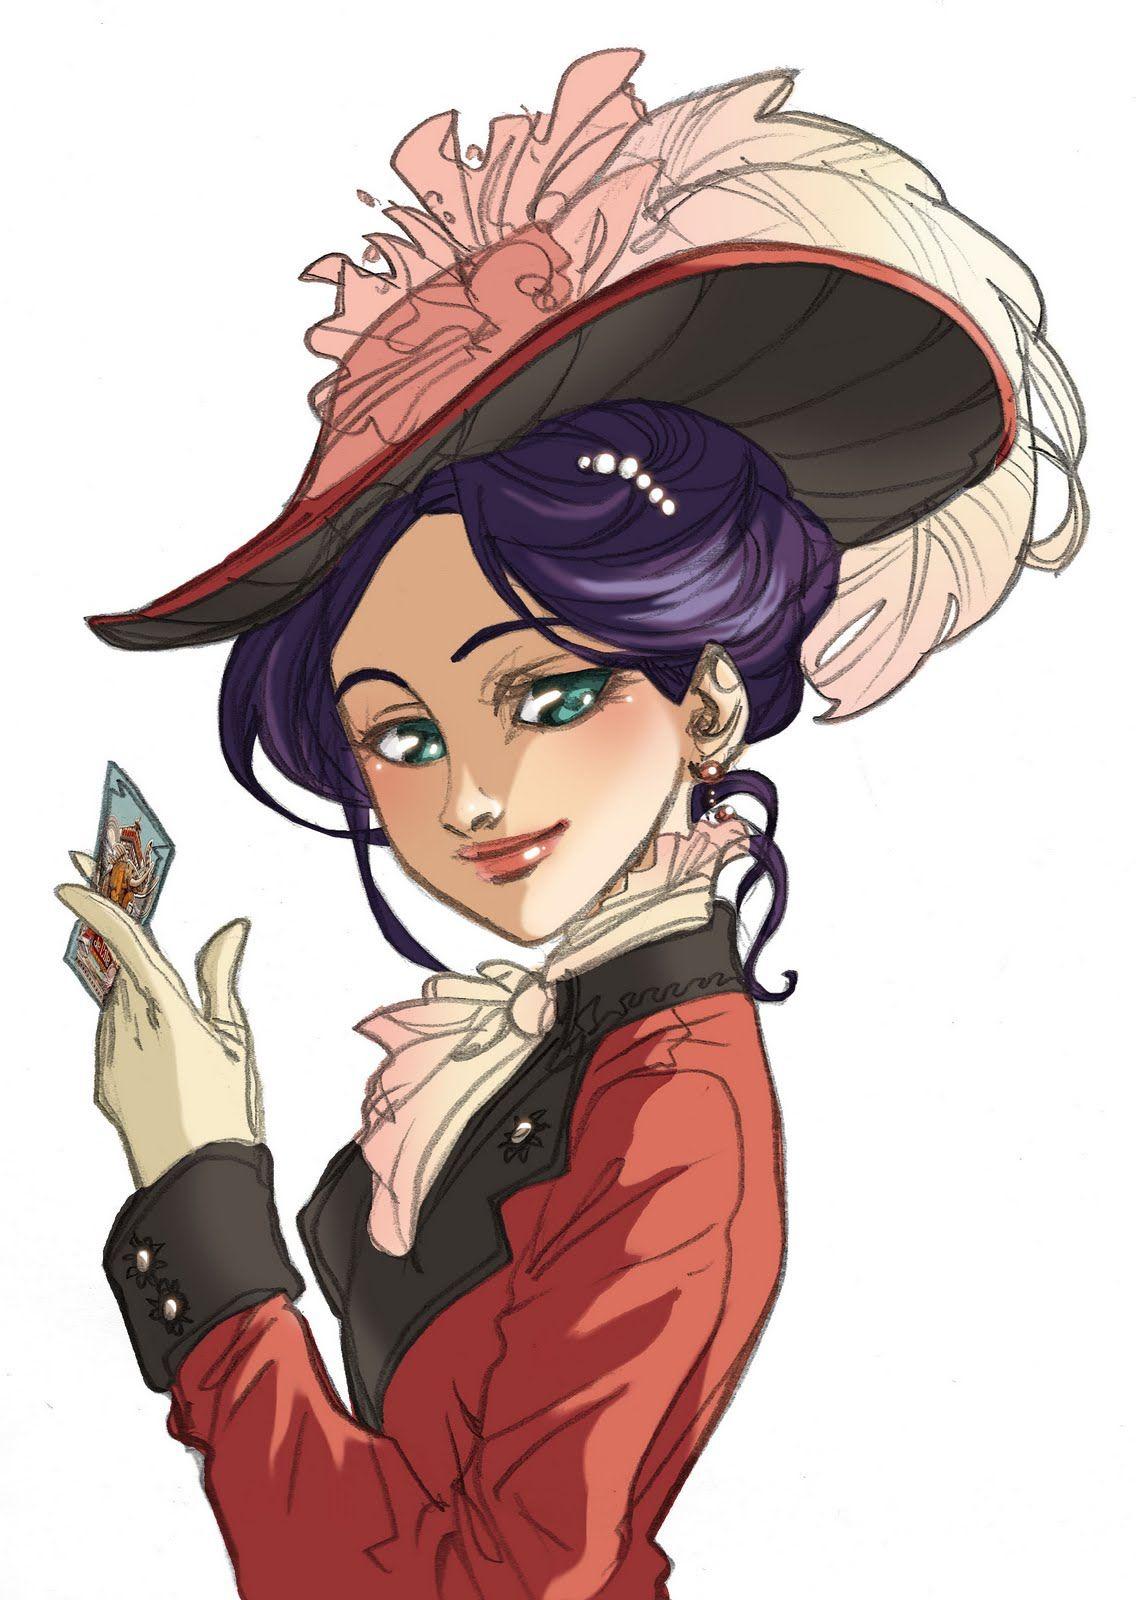 Couverture princesse sara tome 3 myst rieuses h riti res dessin pinterest princesse - Dessin anime de princesse sarah ...